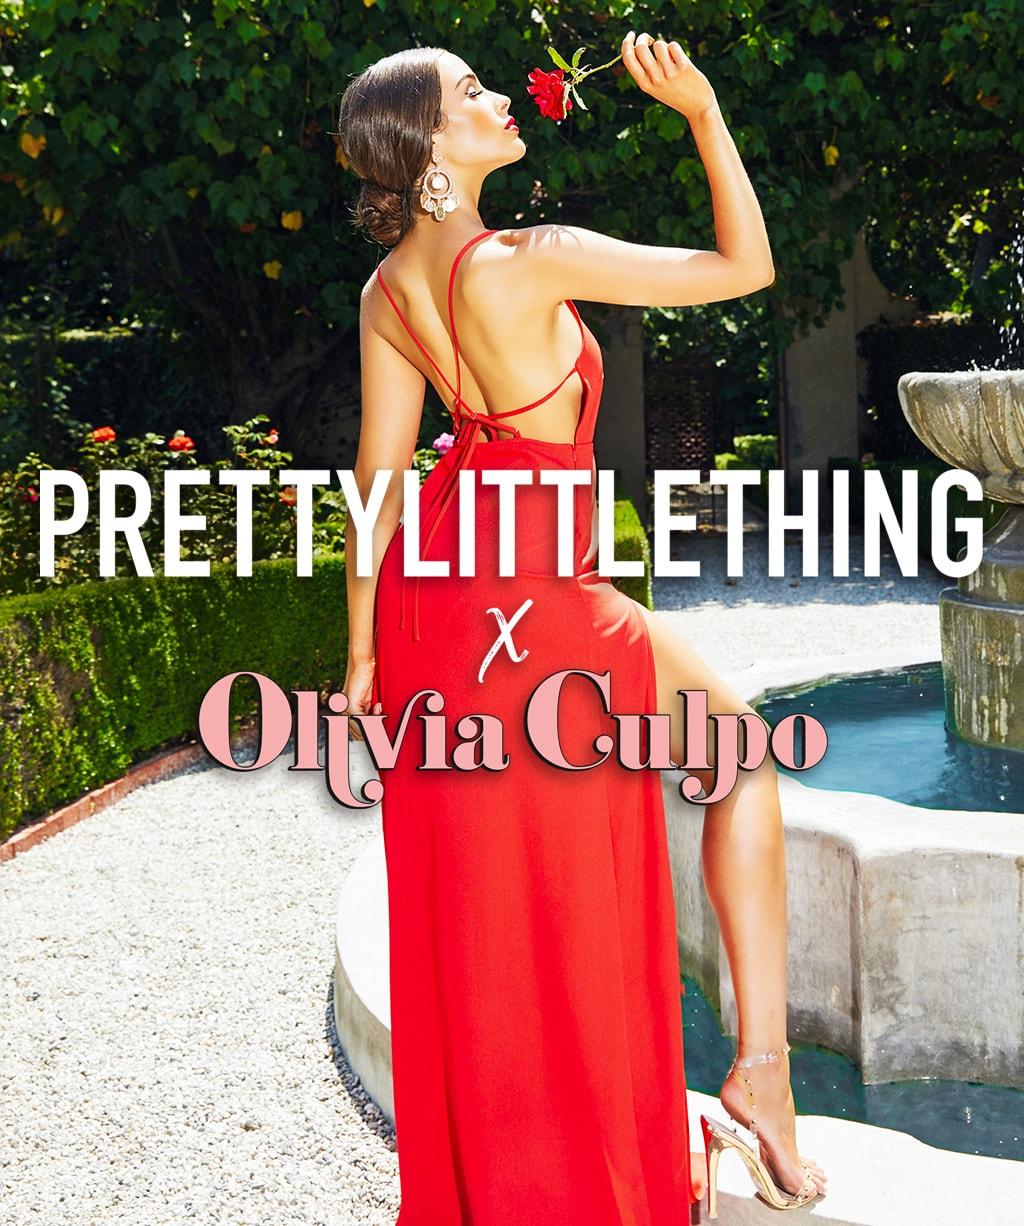 Olivia Culpo Ad   PrettyLittleThing